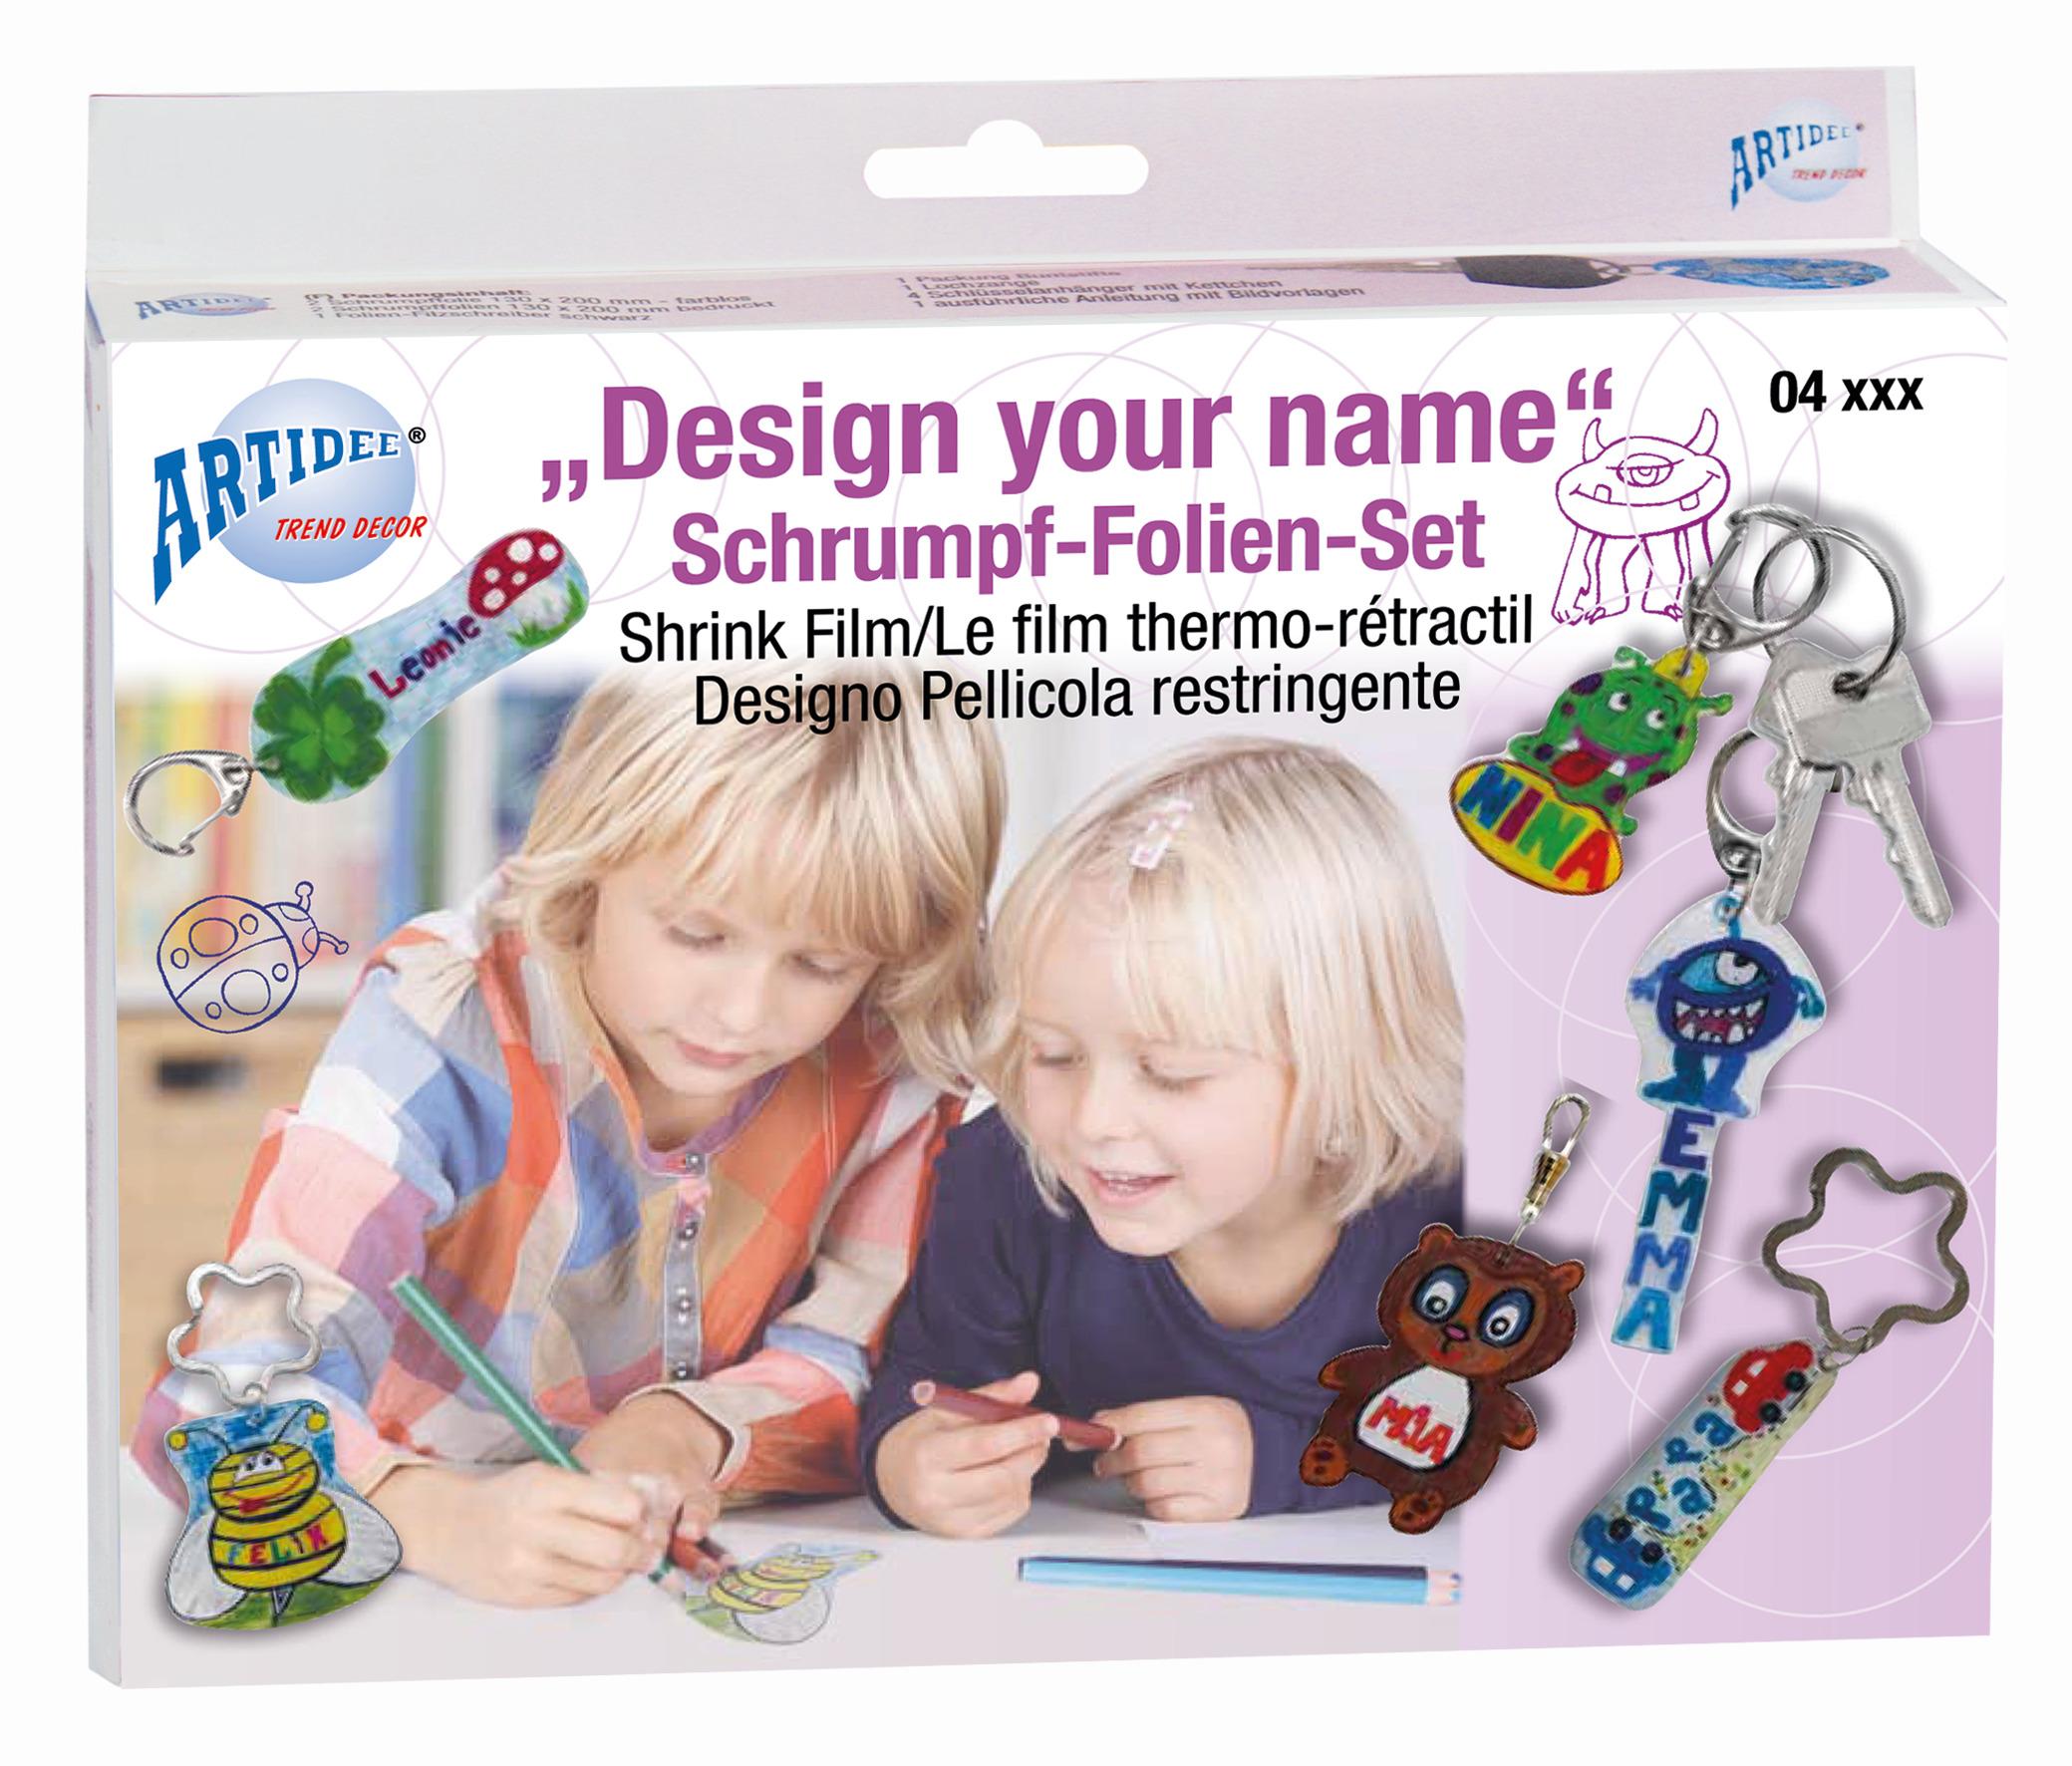 Schrumpffolien-Set Design Your Name